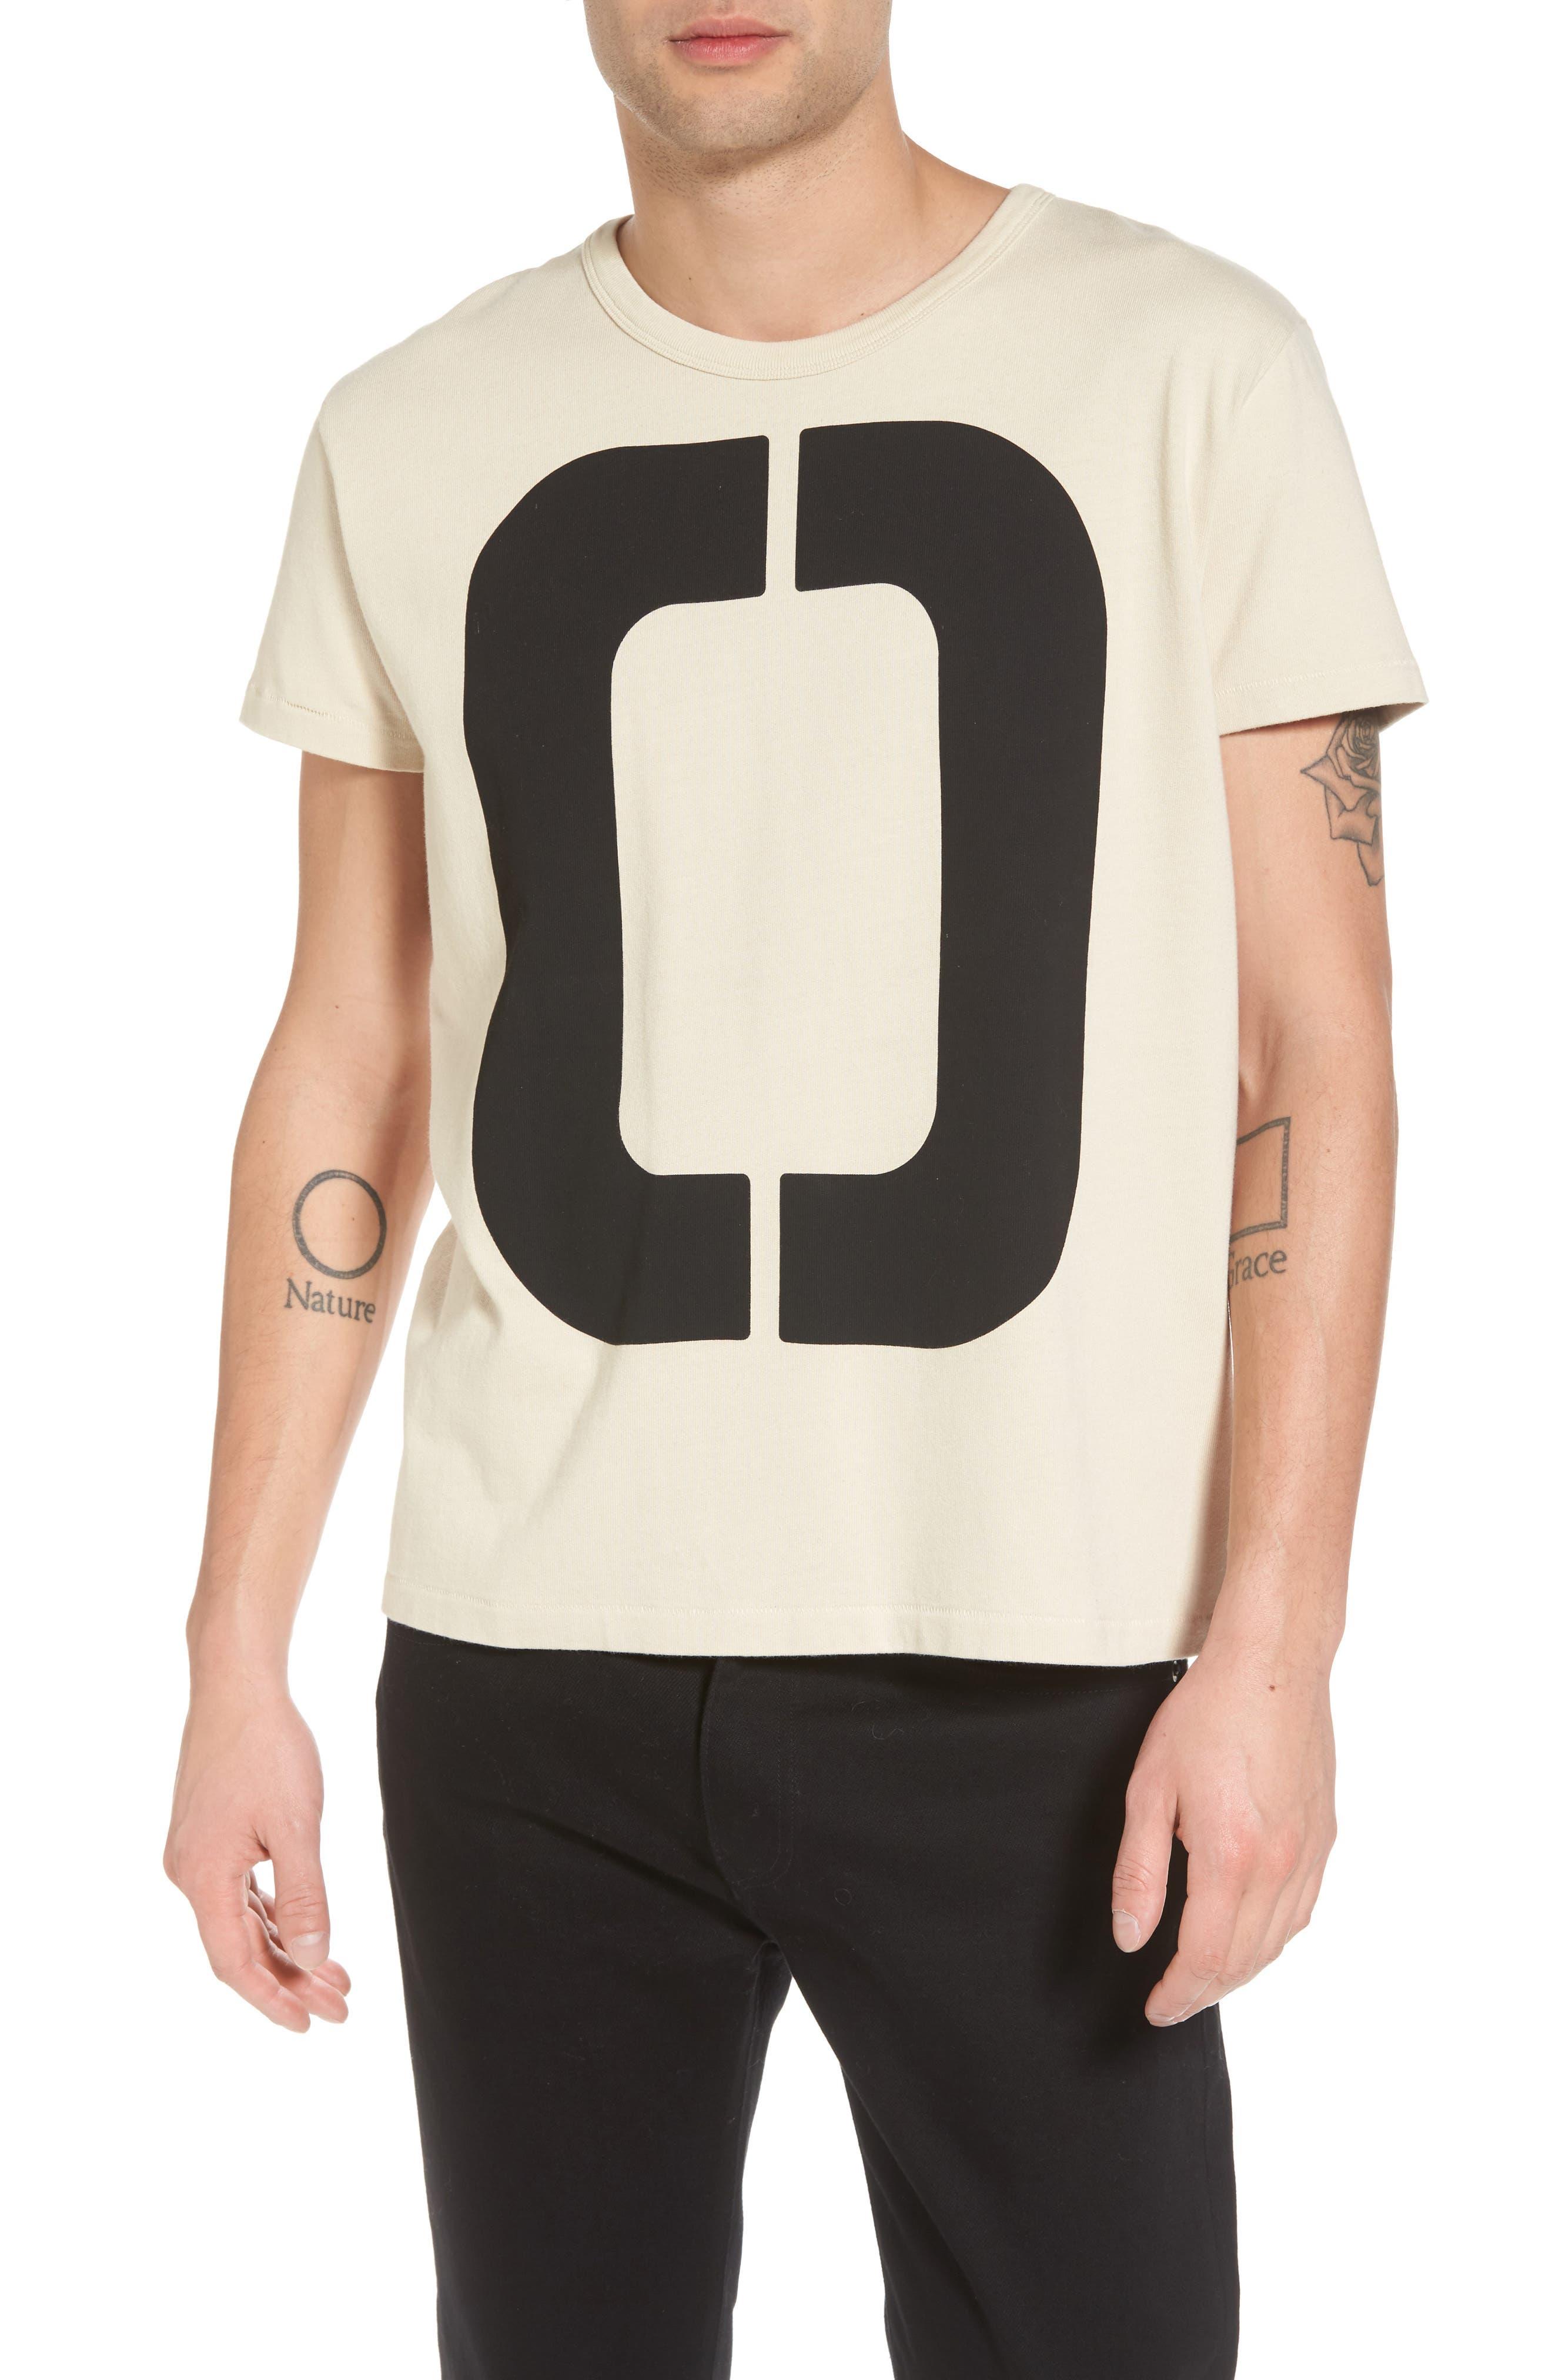 1960s Loose Graphic T-Shirt,                             Main thumbnail 1, color,                             Zero Sand Shell